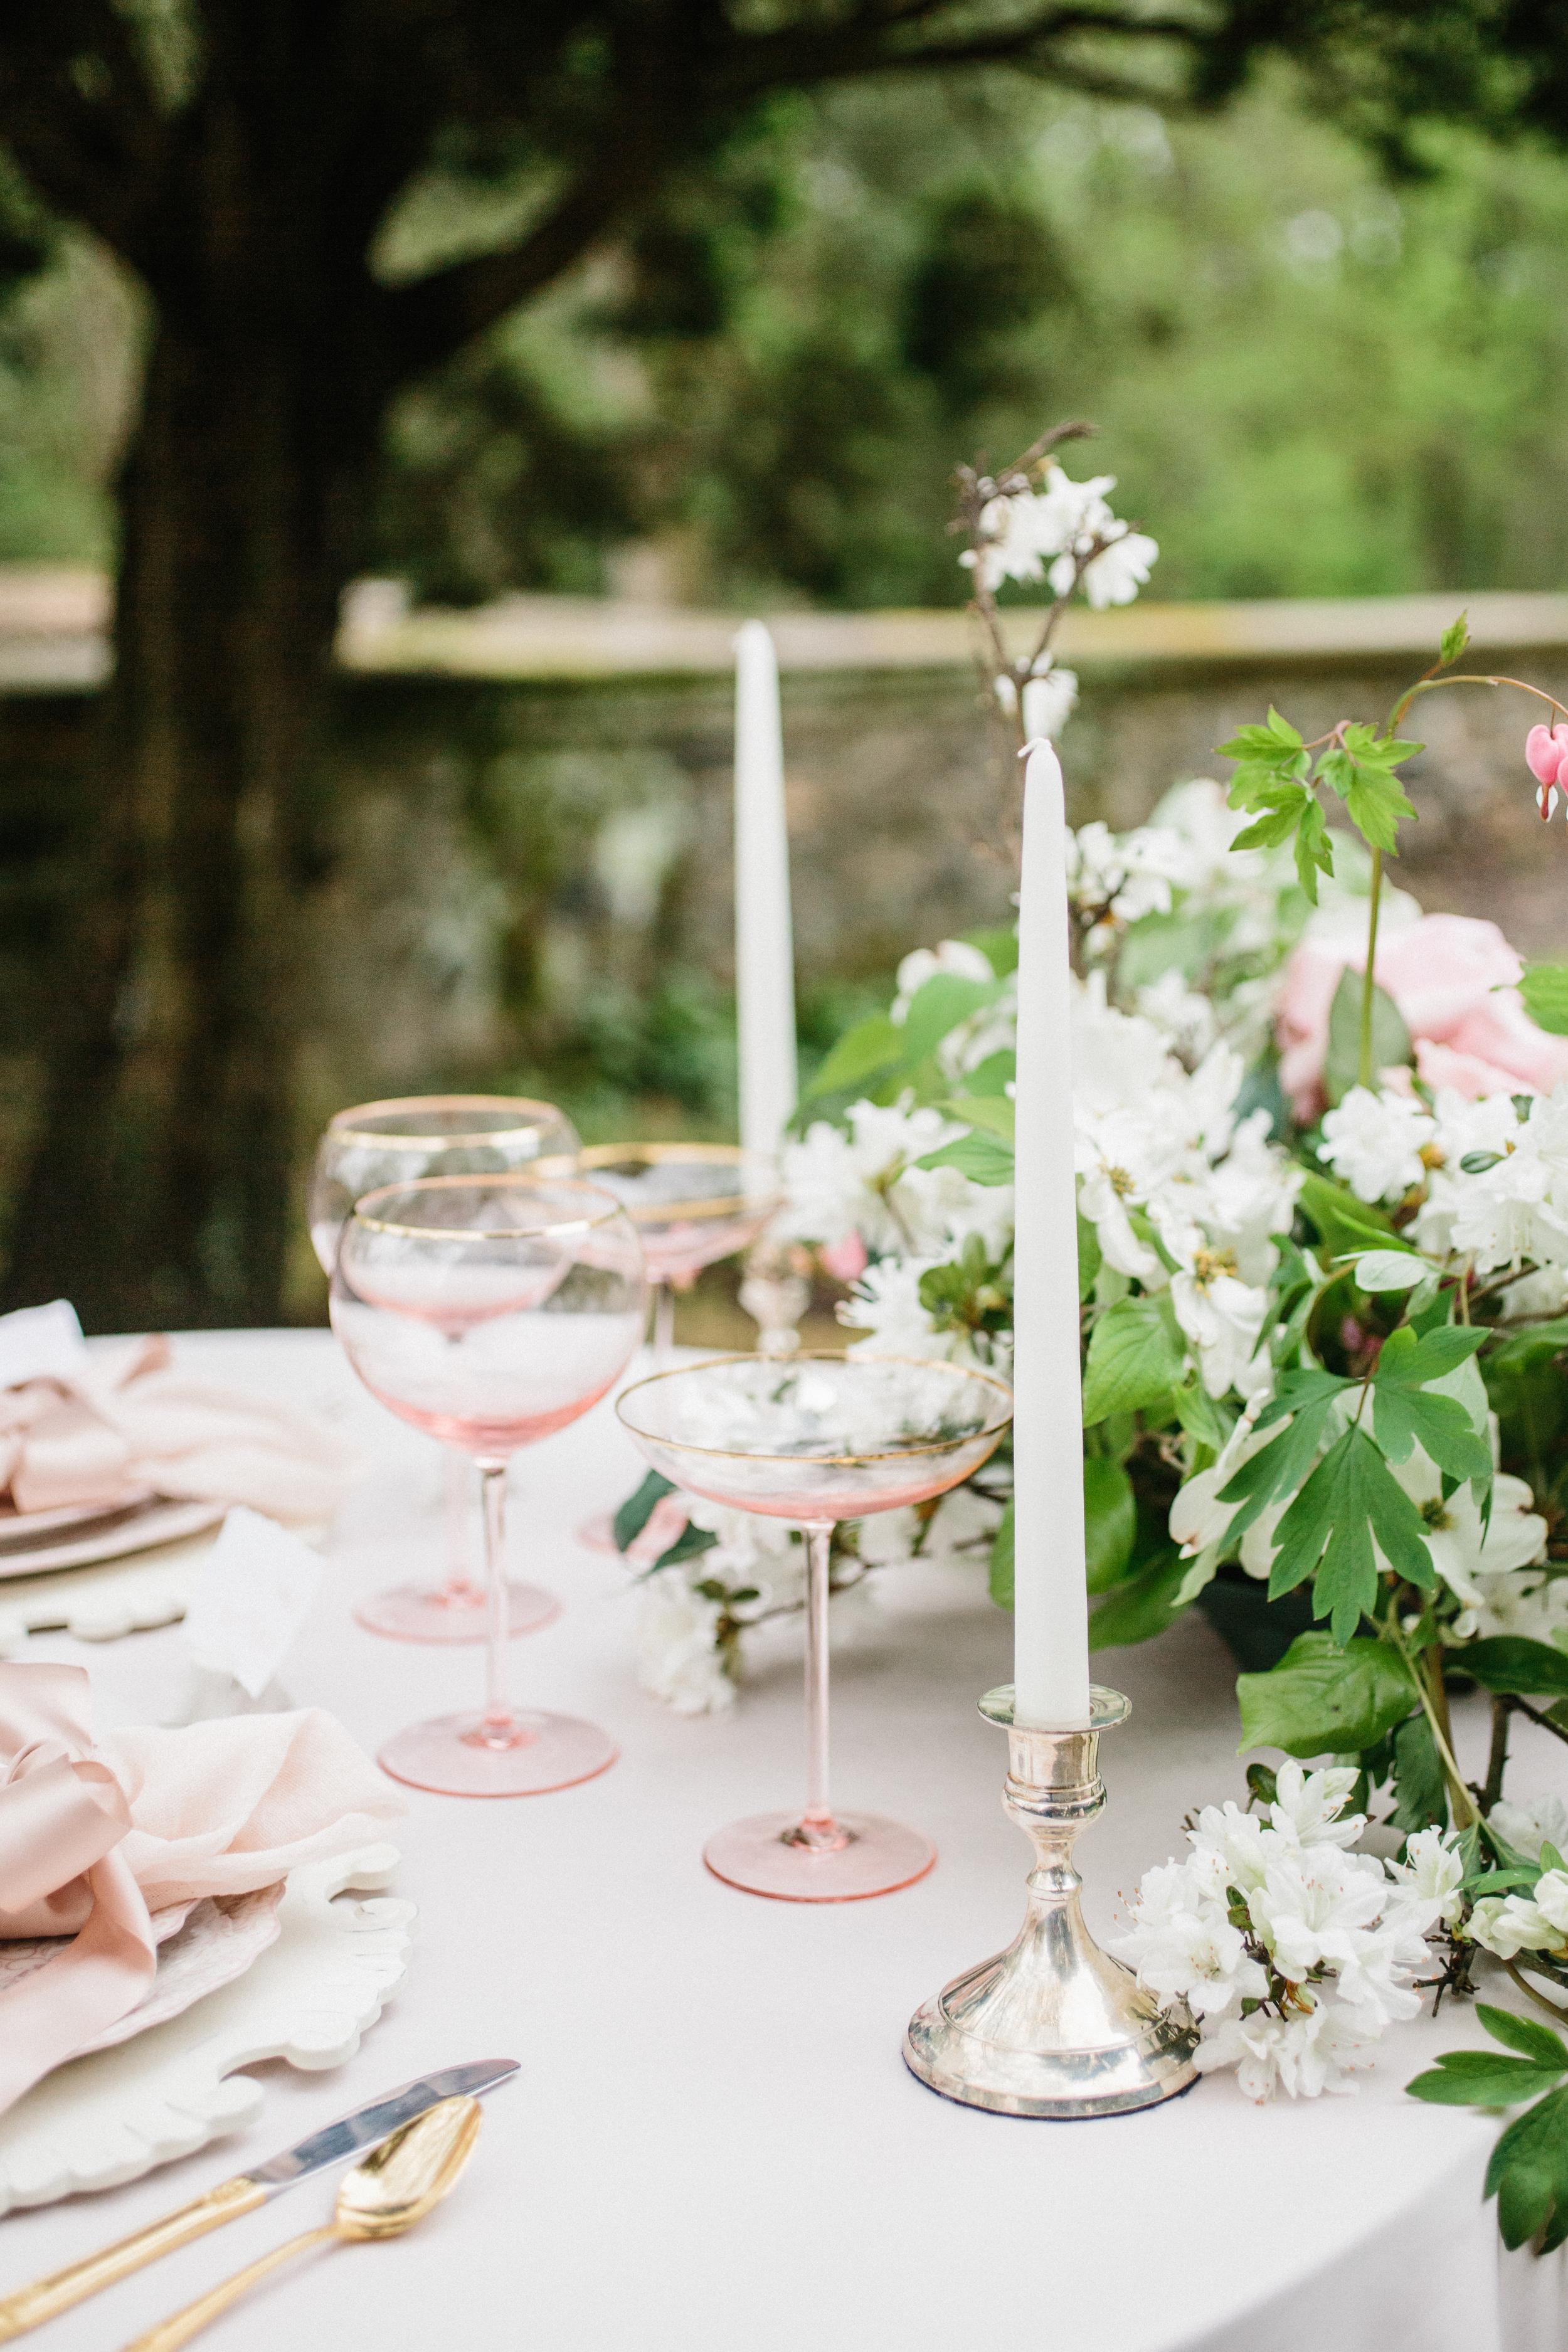 HNP-Modern-Fairytale-Spring-Wedding-Styled-Shoot_104.jpg